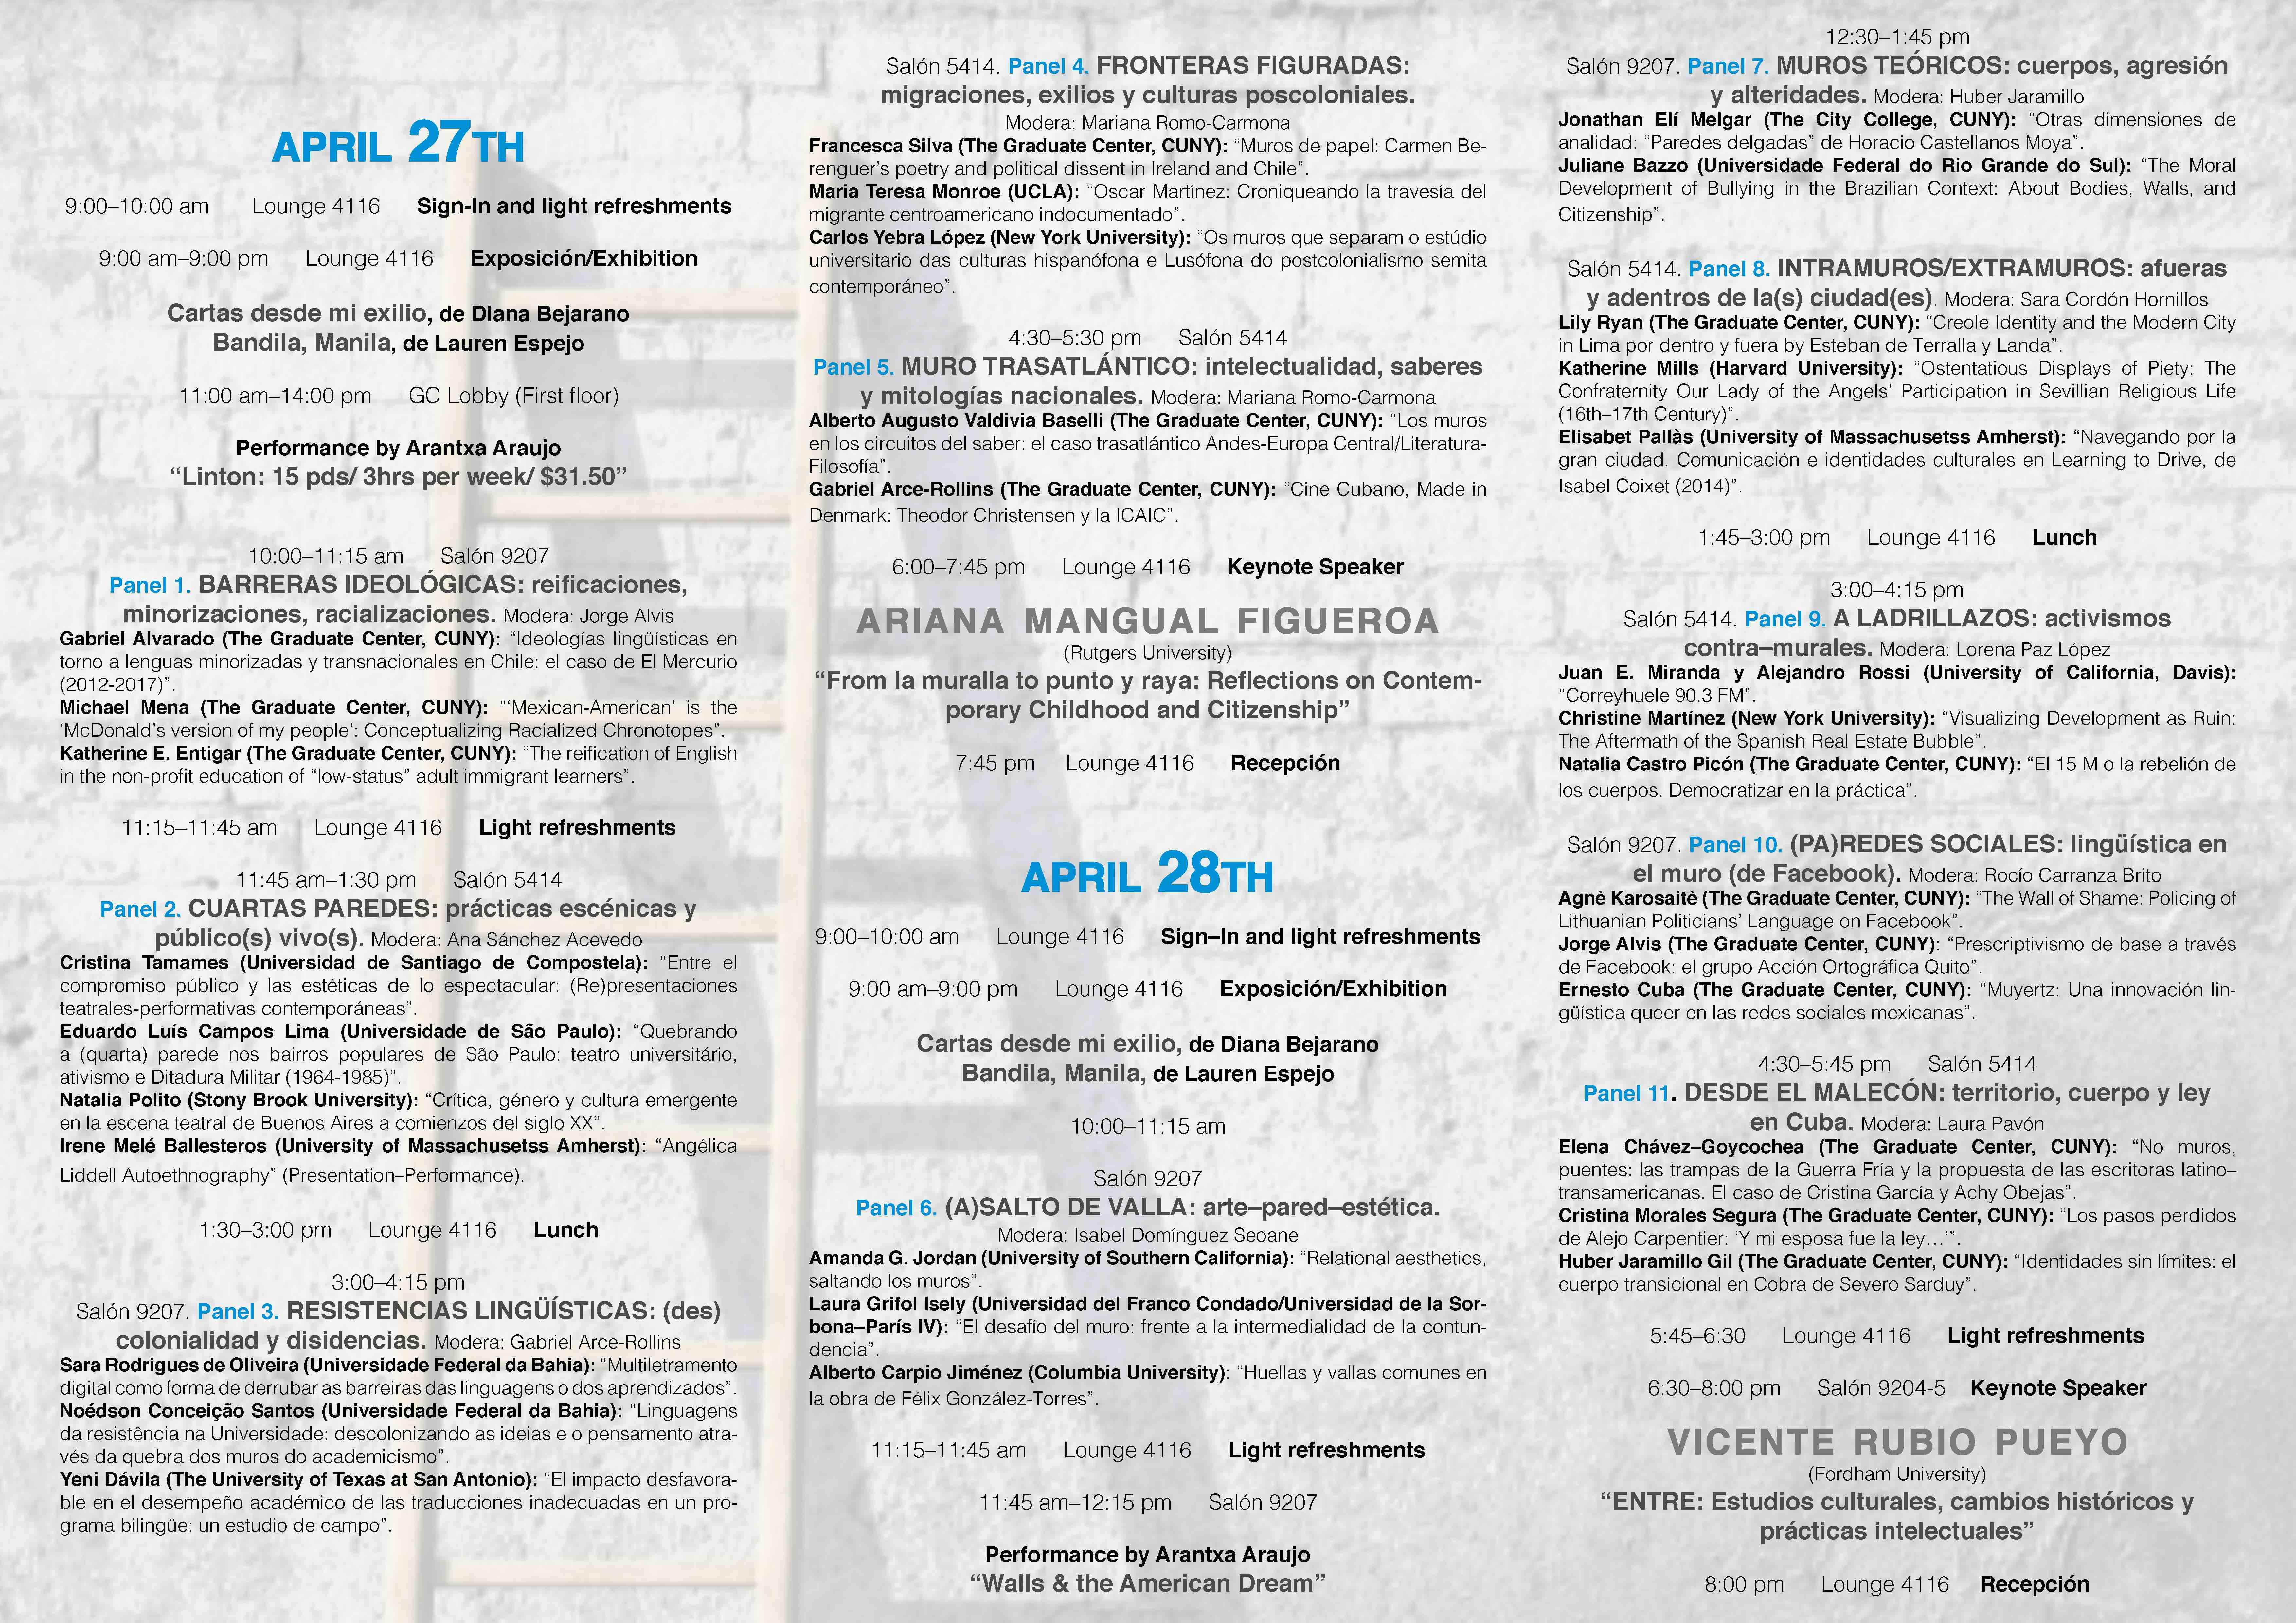 folleto-programa-1punto9mb